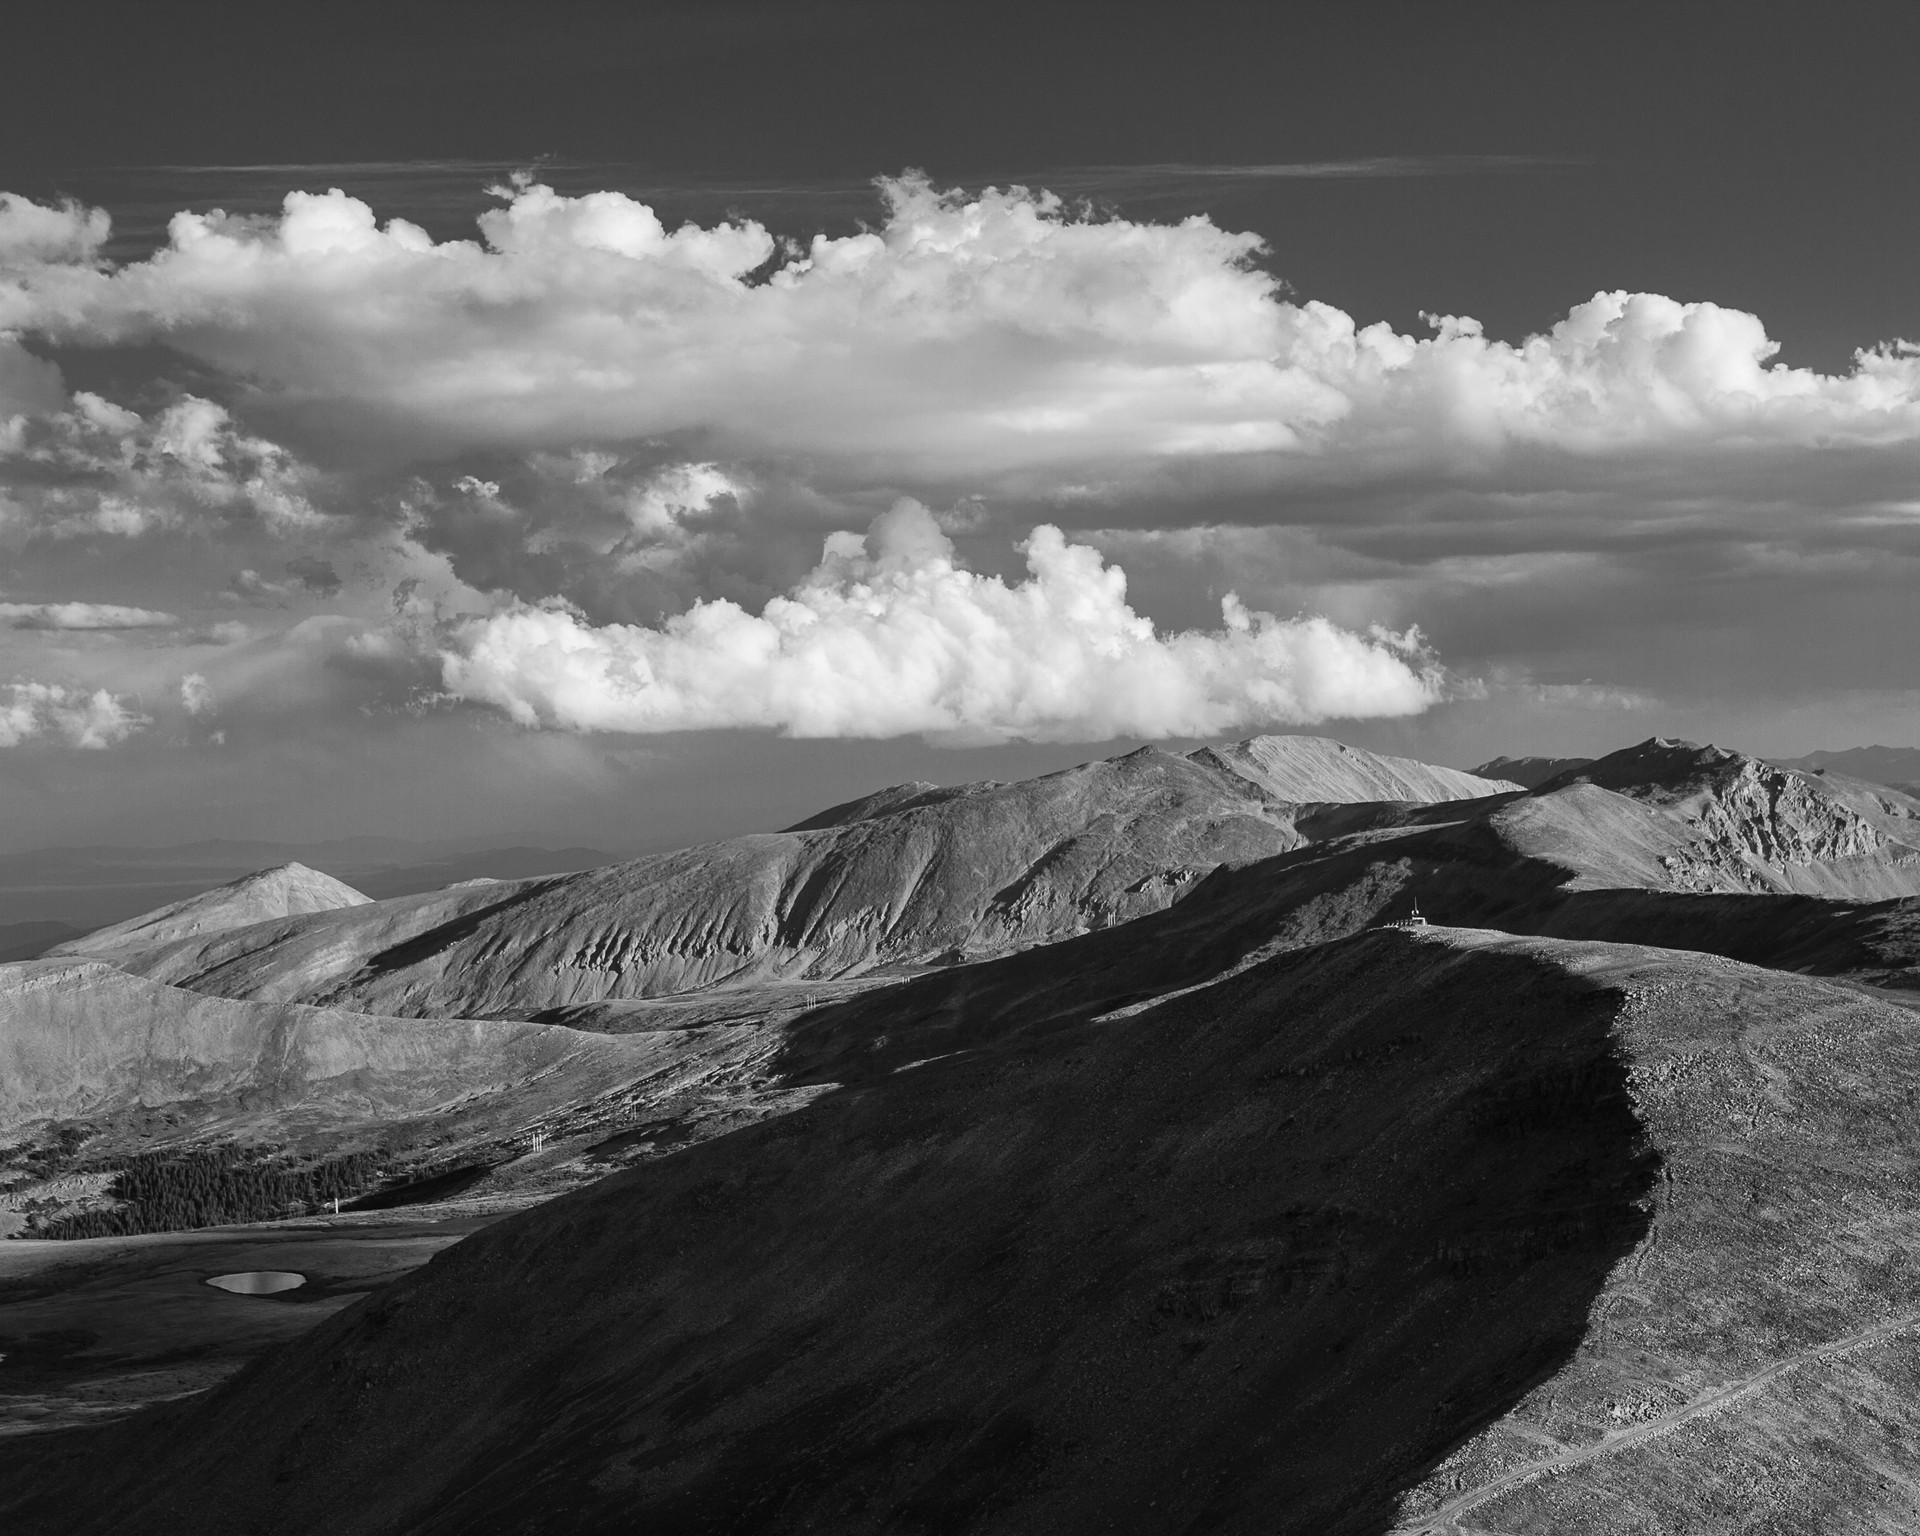 Mount Sherman